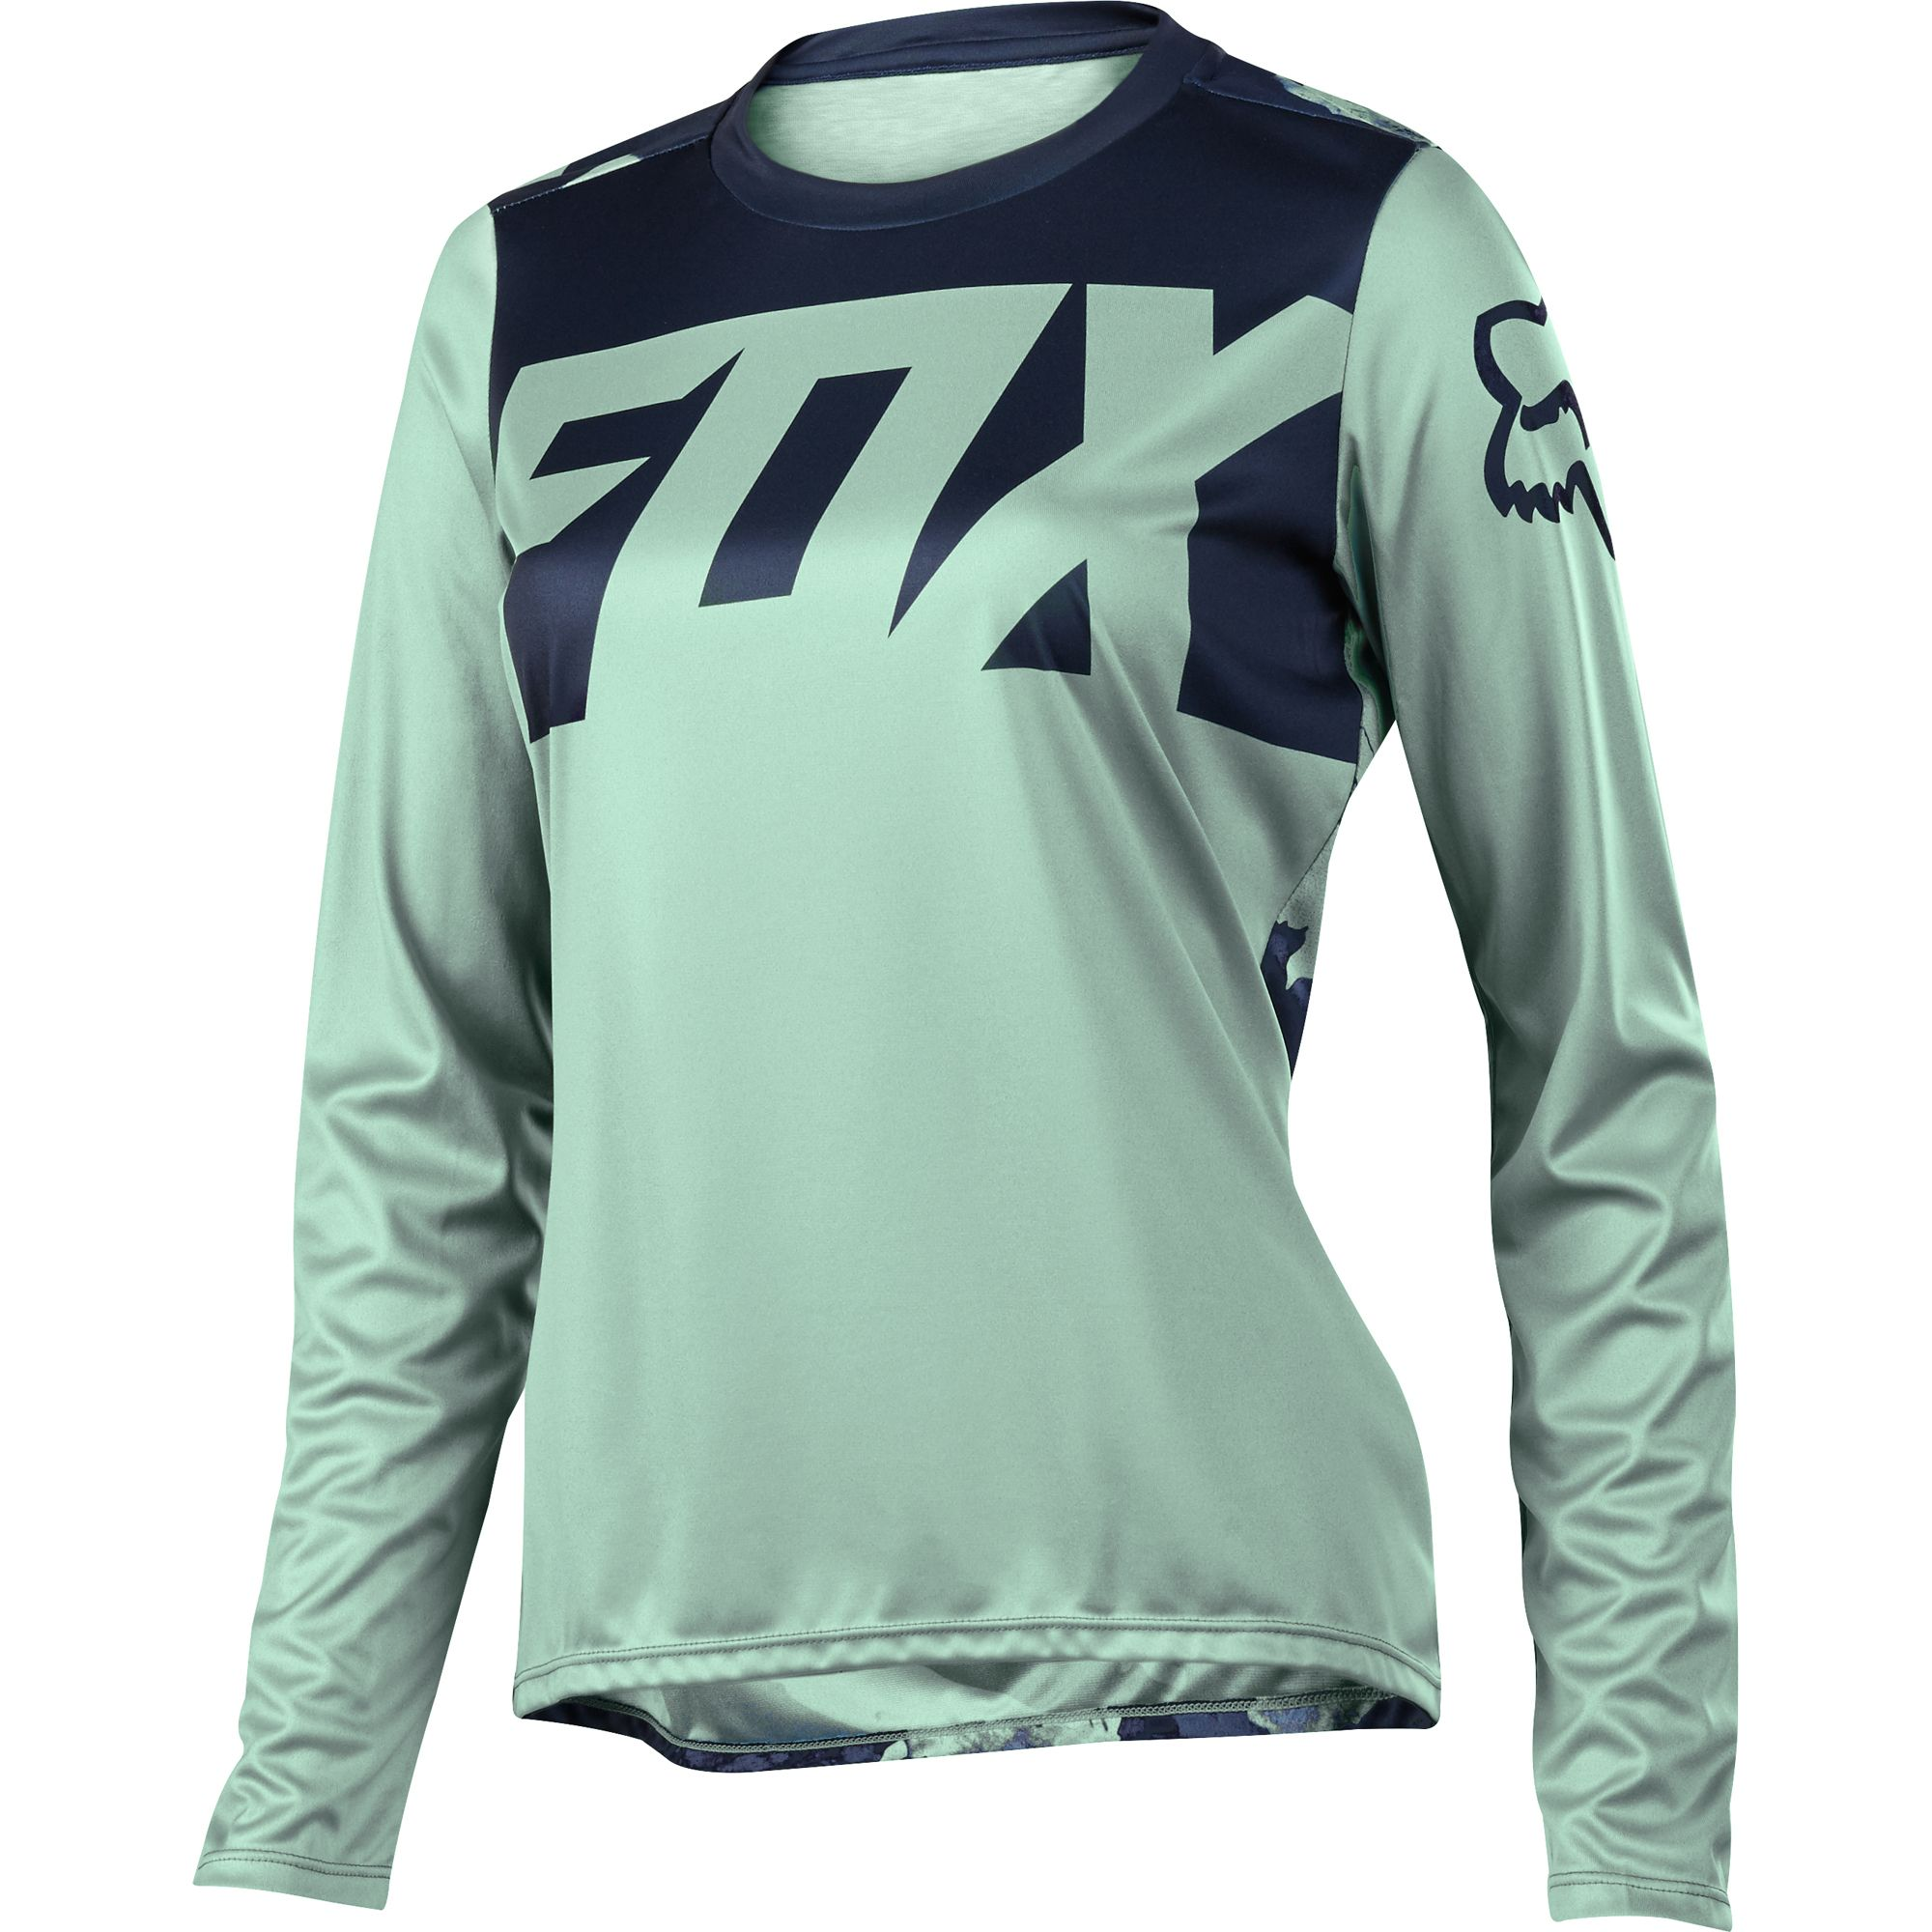 Image Result For Fox Ripley Women S Long Sleeve Mtb Jersey Sage Nz Fox Racing Clothing Fox Racing Fox Clothing